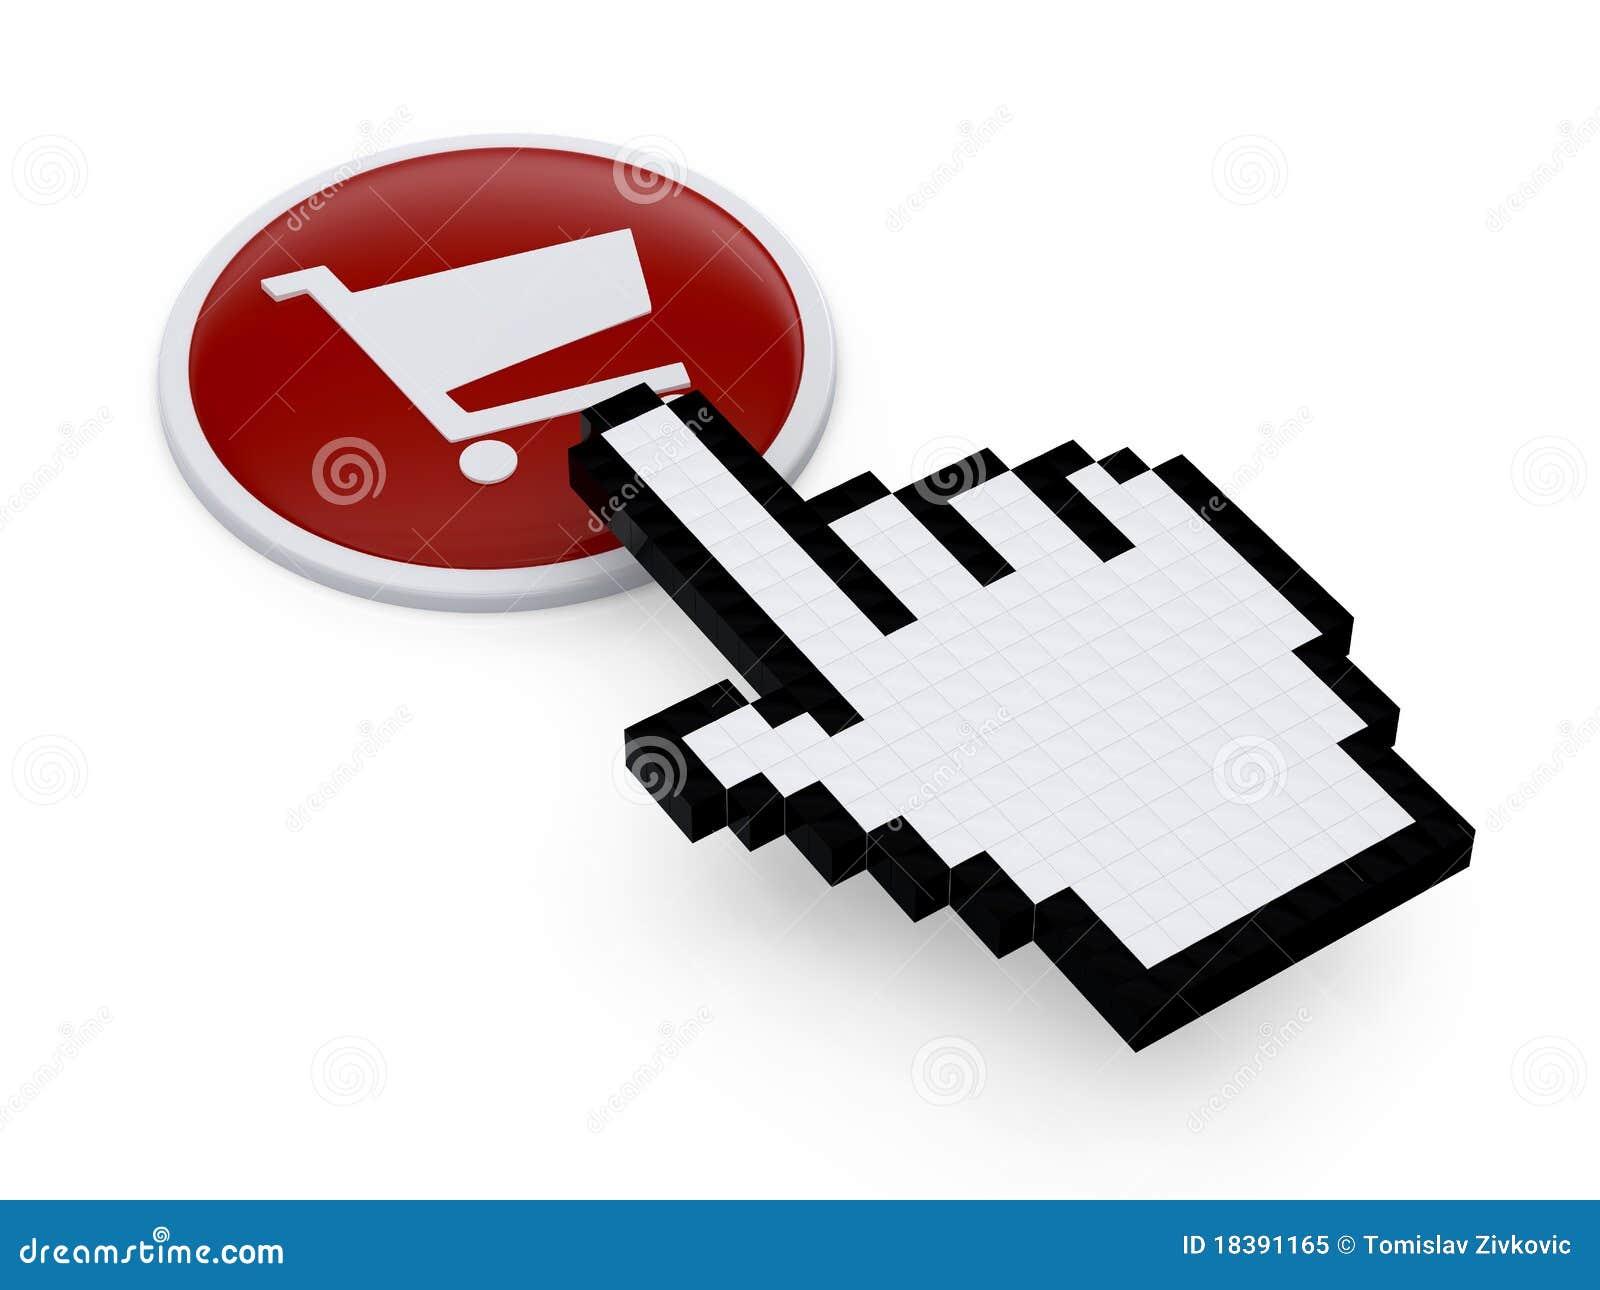 указатель руки pixelated мышью